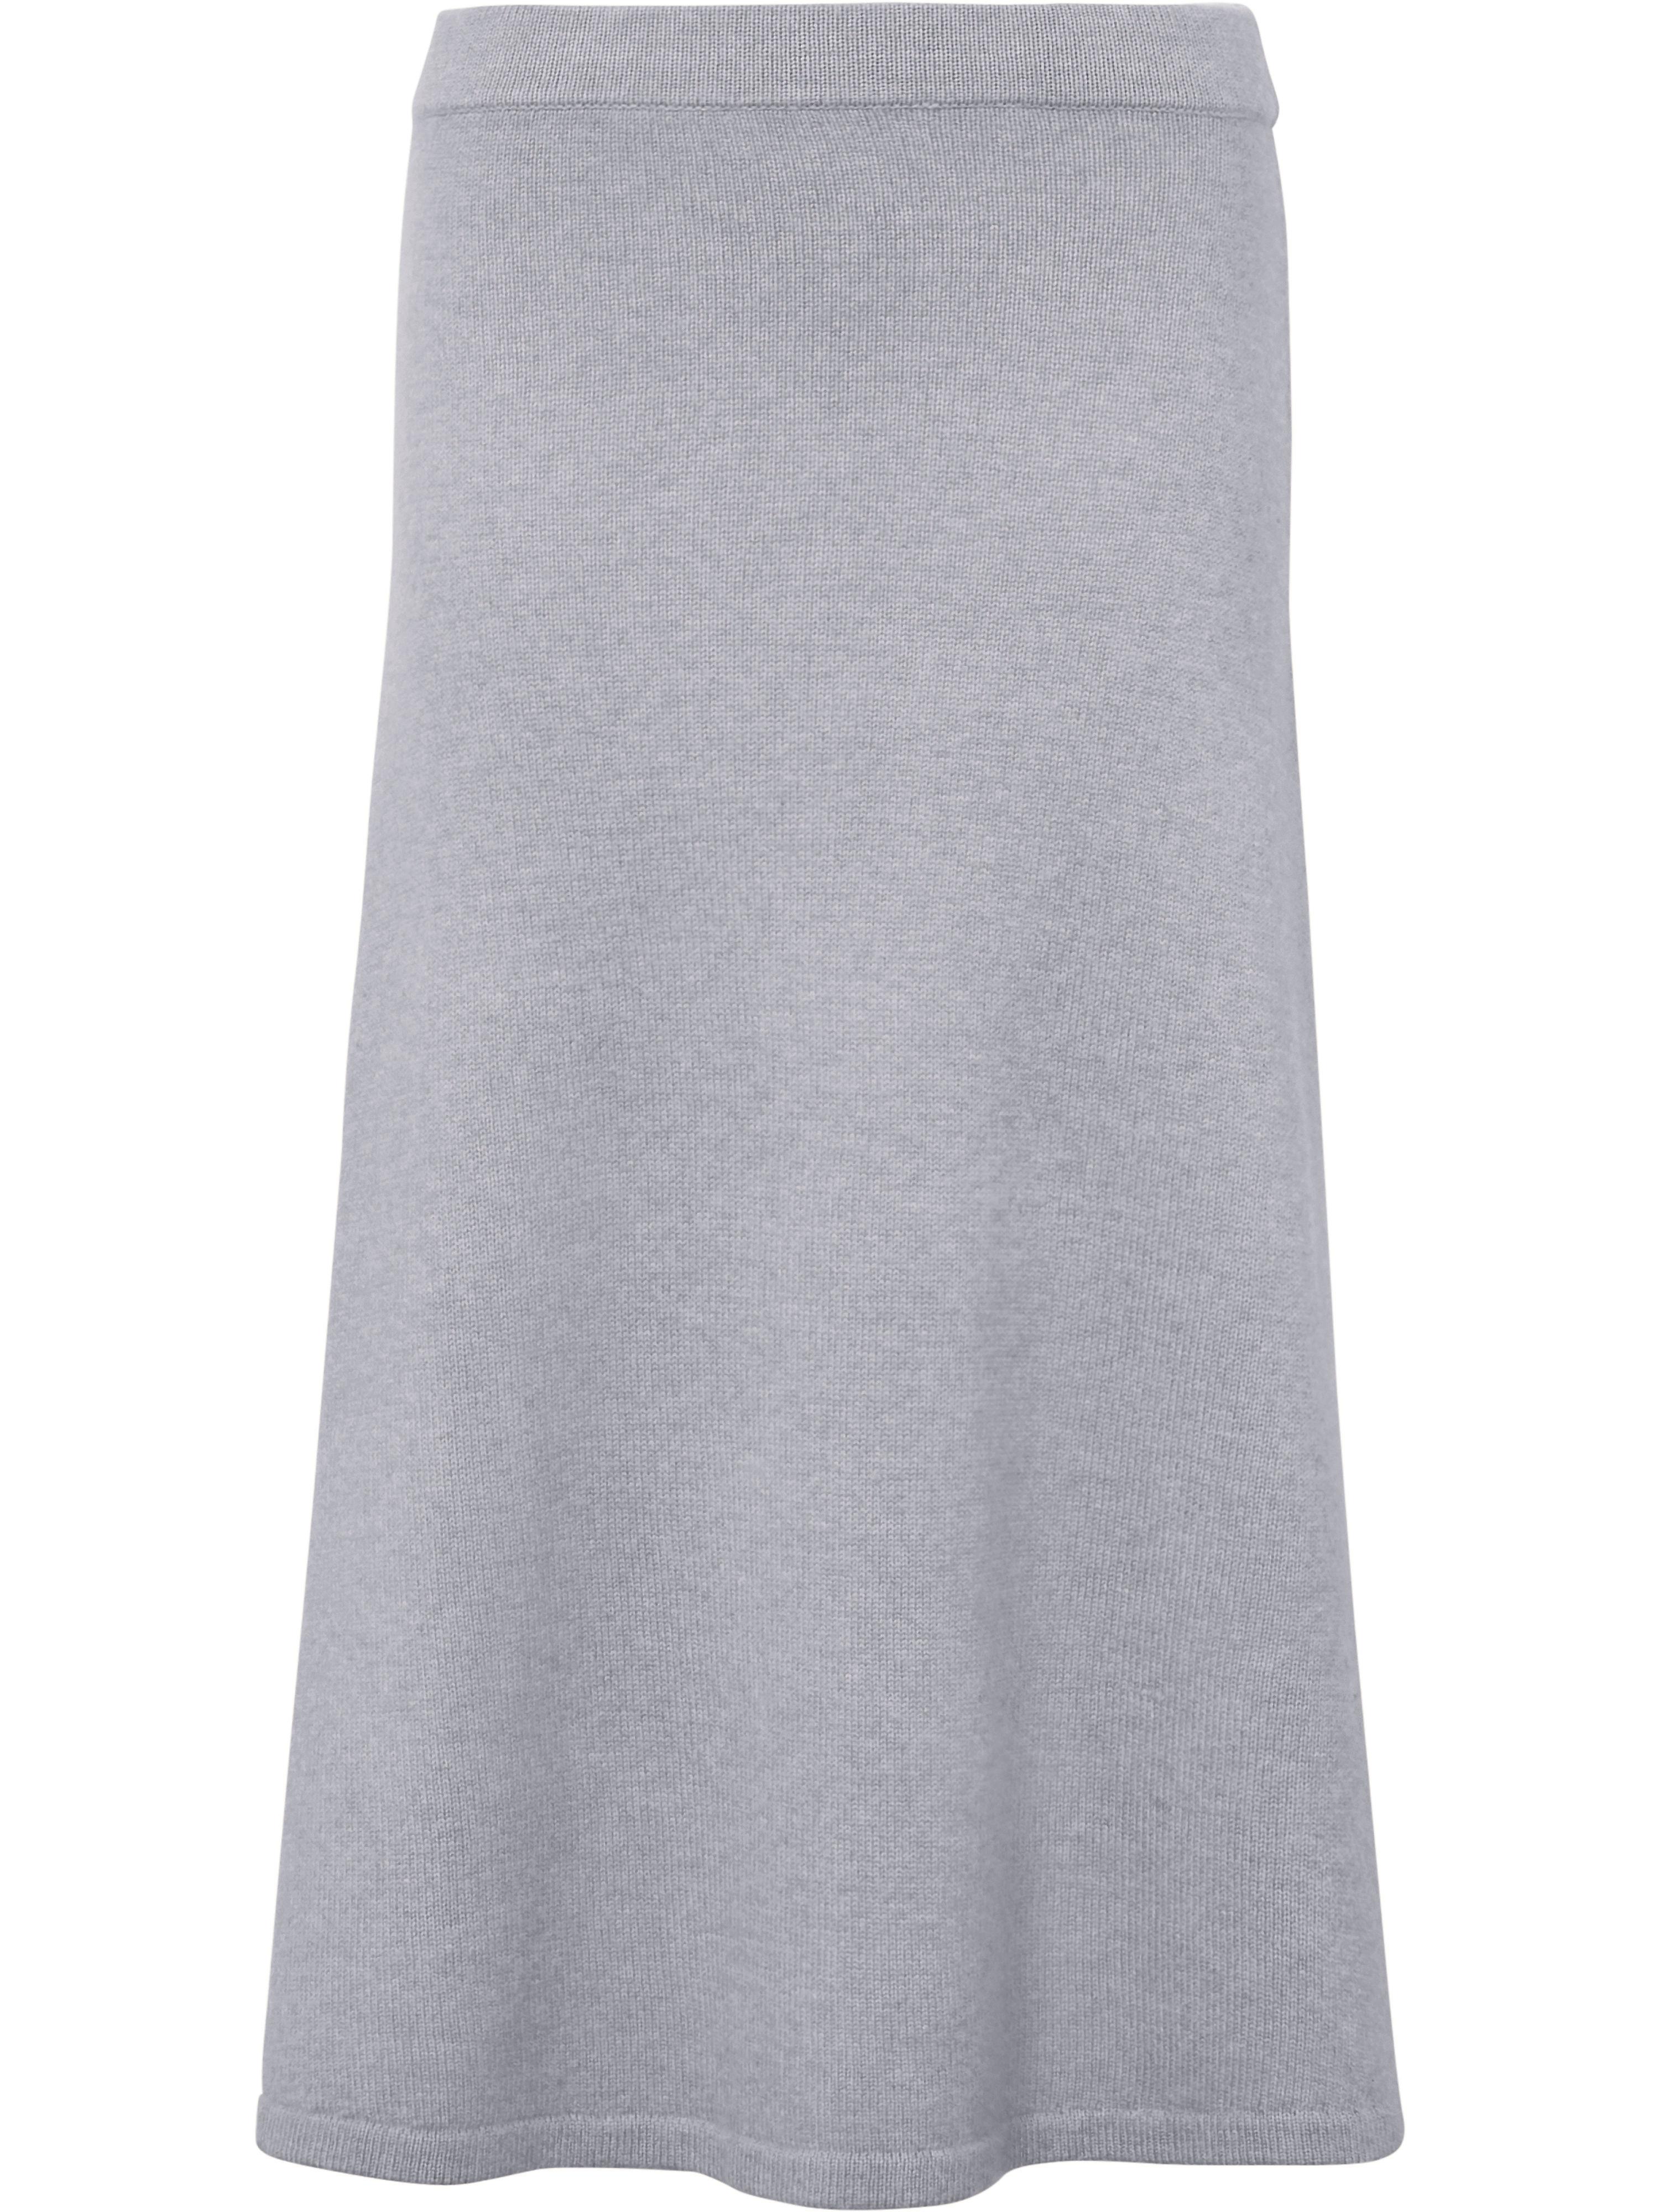 La jupe  include gris taille 48